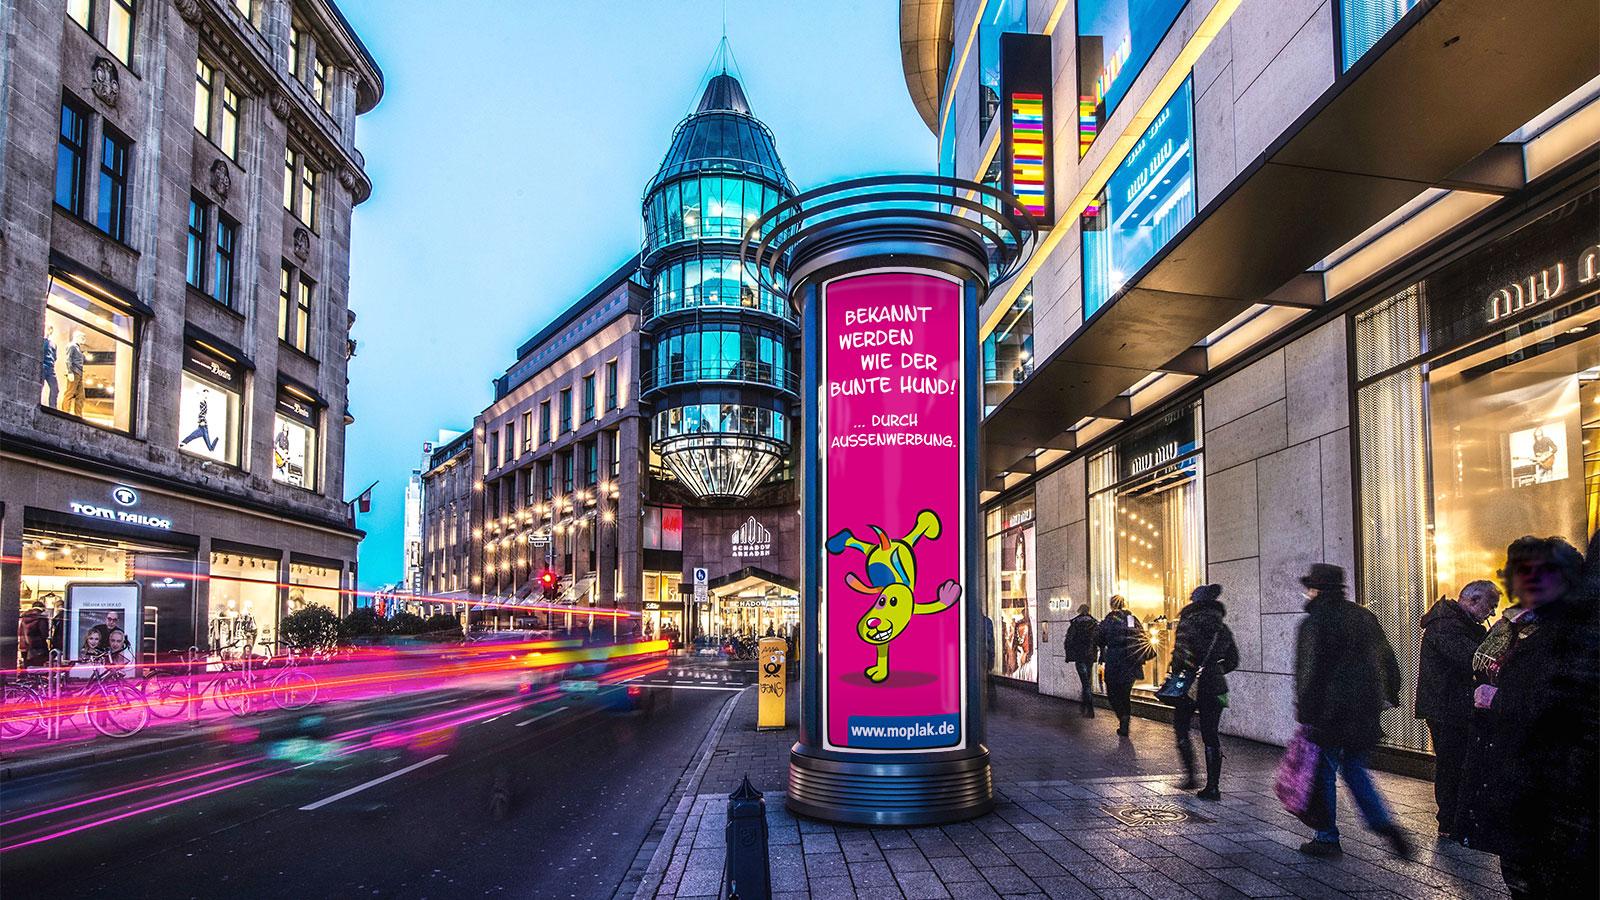 Duesseldorf-Aussenwerbung-Litfasssaeule-Werbung